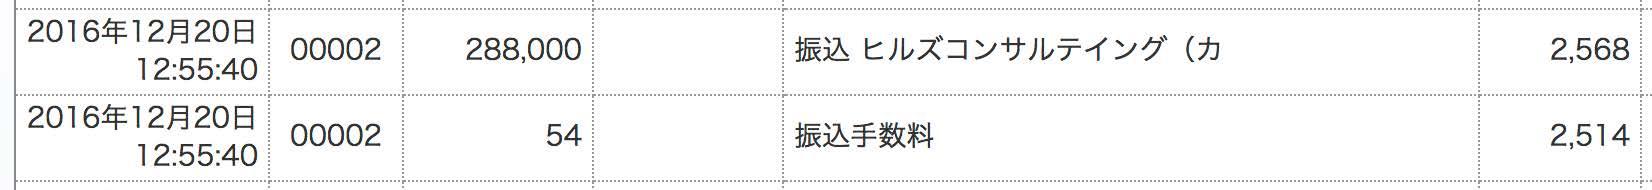 2514円